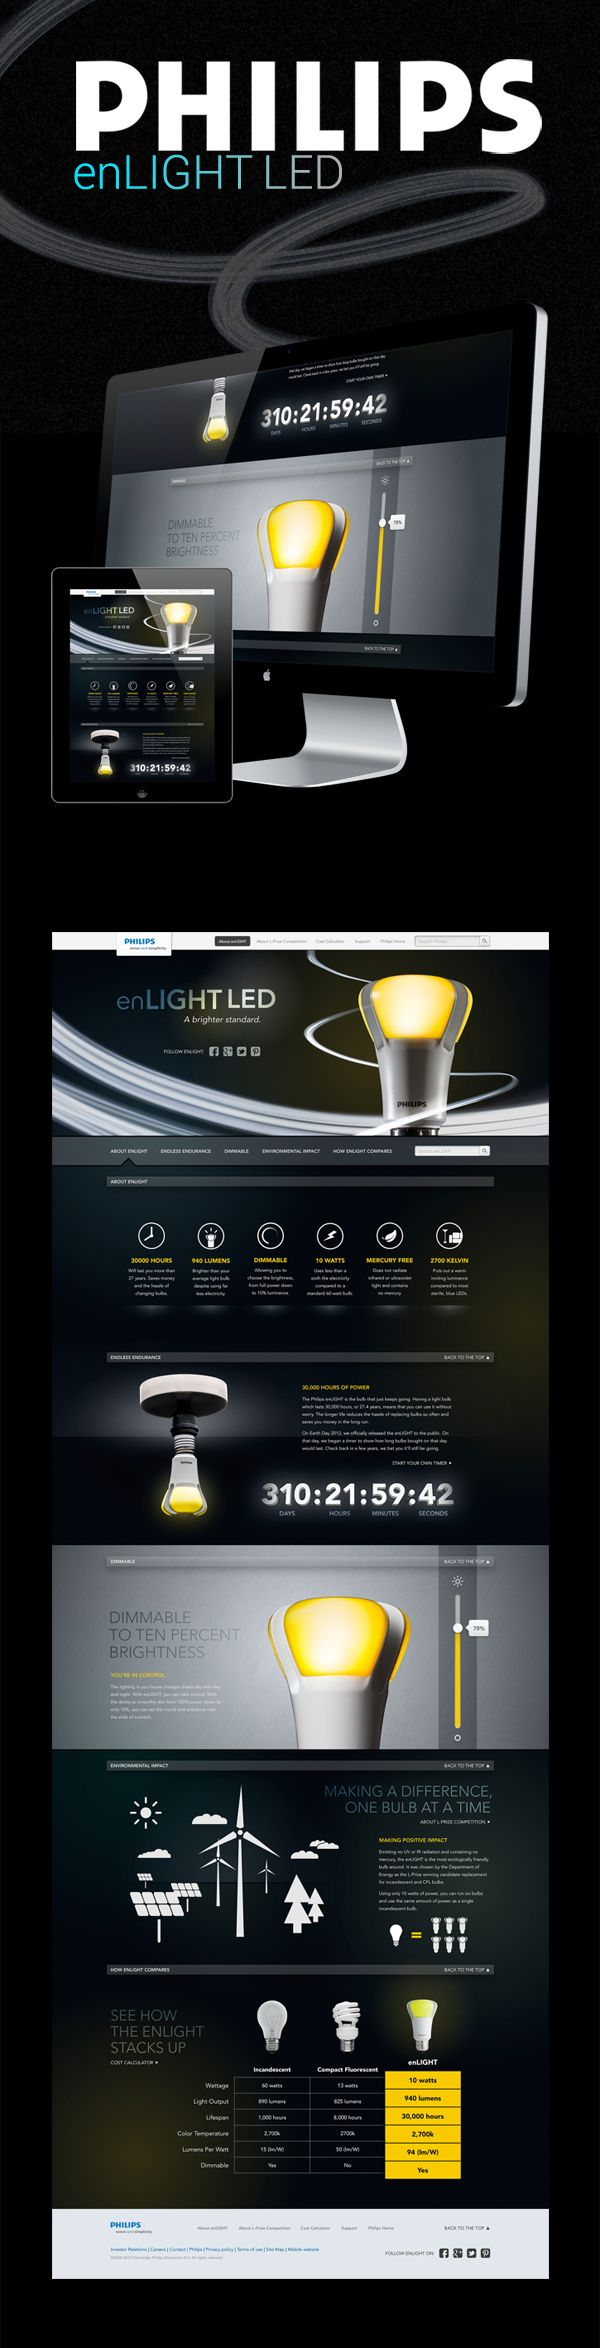 Philips LED Branding web site by Justin Marimon, via Behance